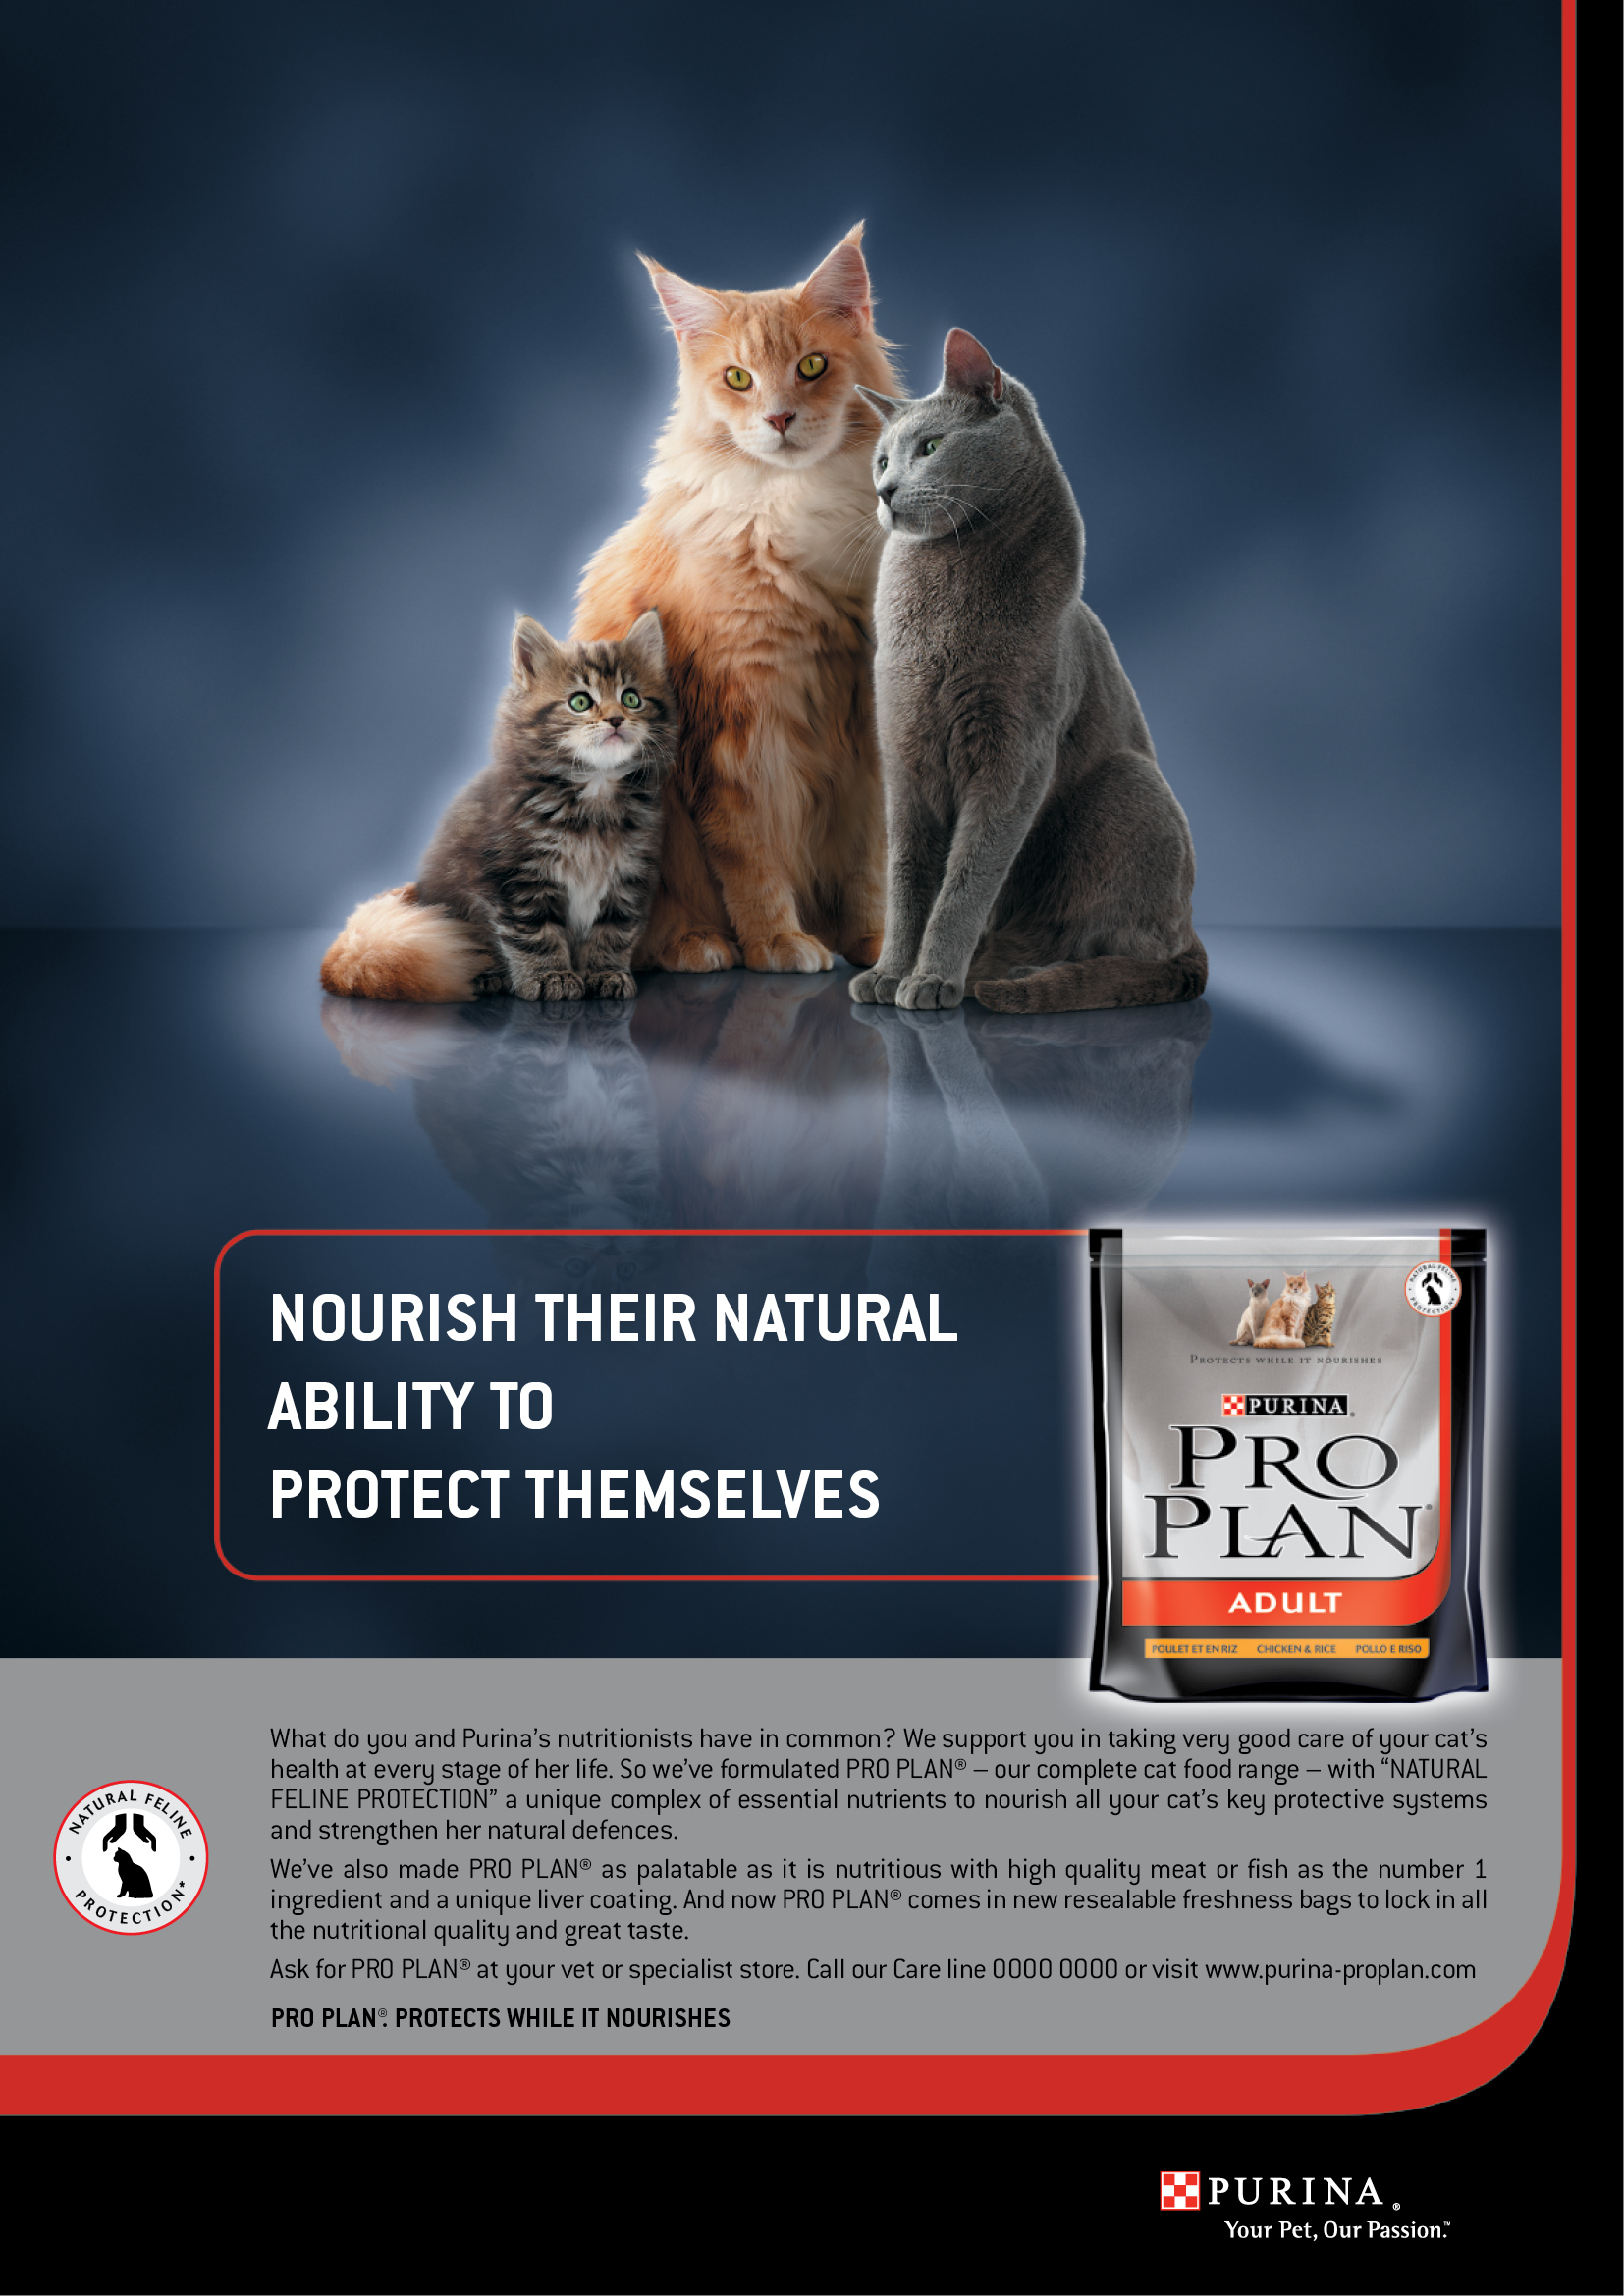 Proplan Ads.jpg